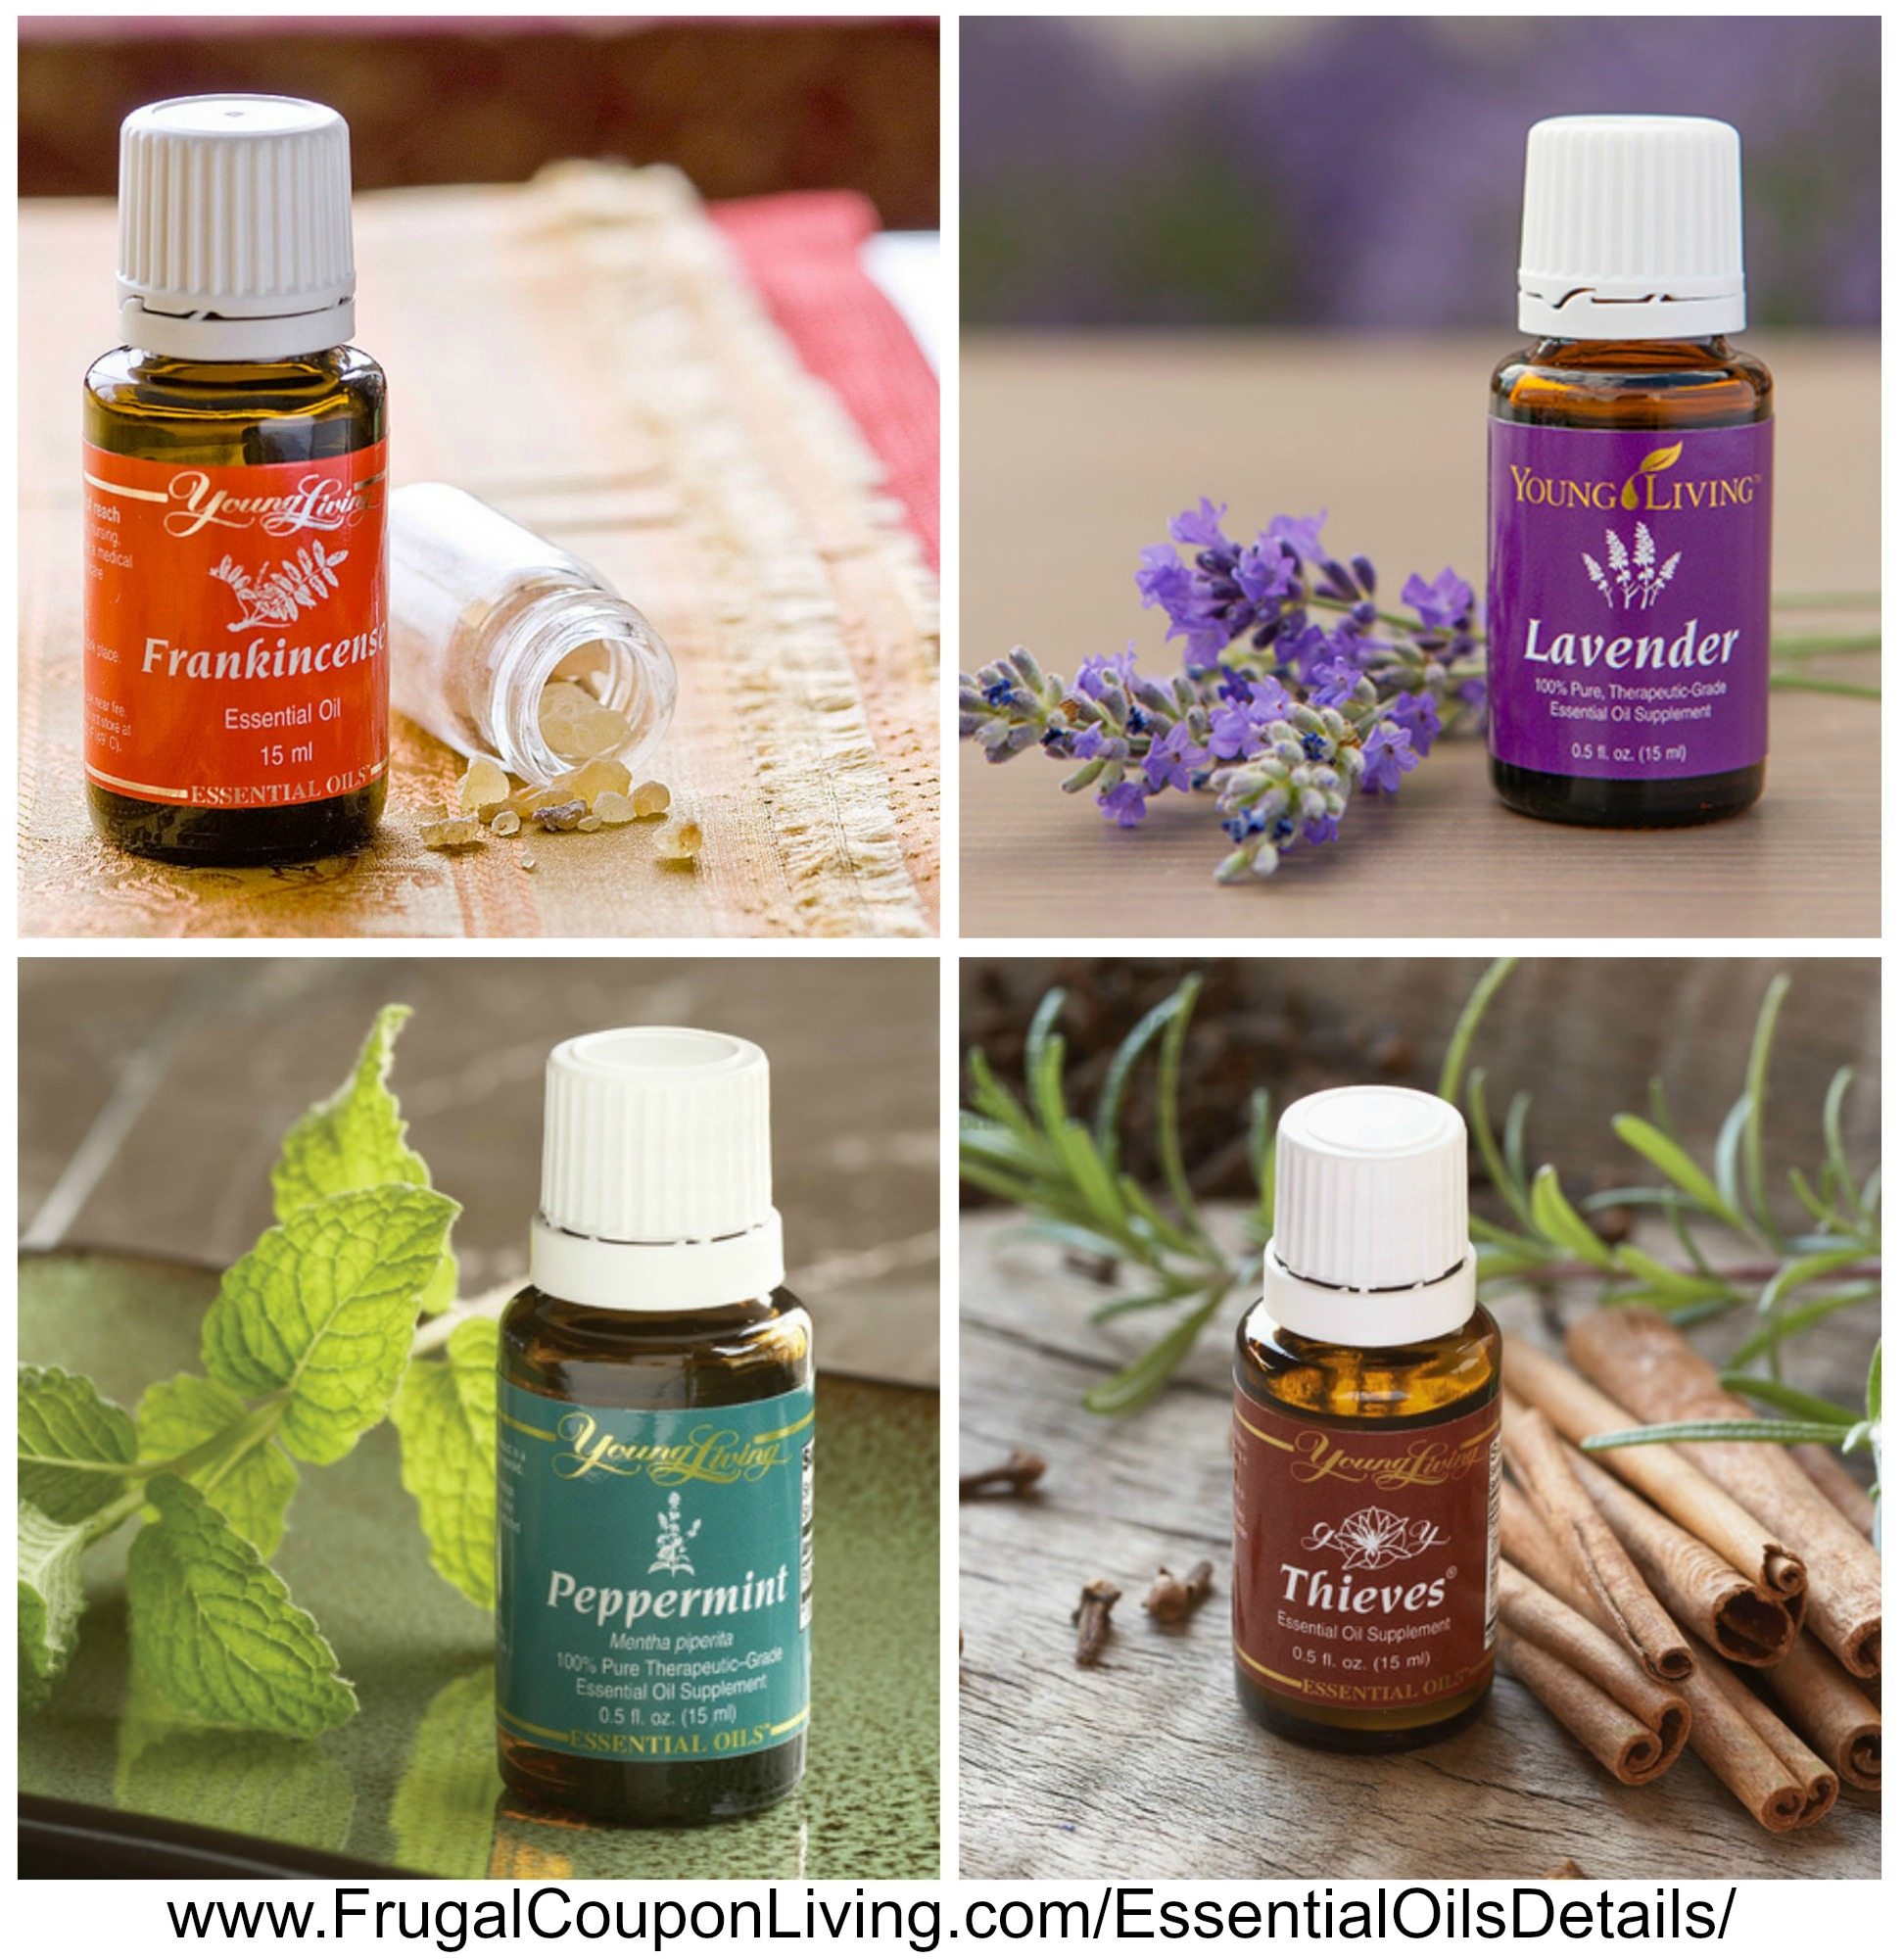 Essential-oils-details-collage